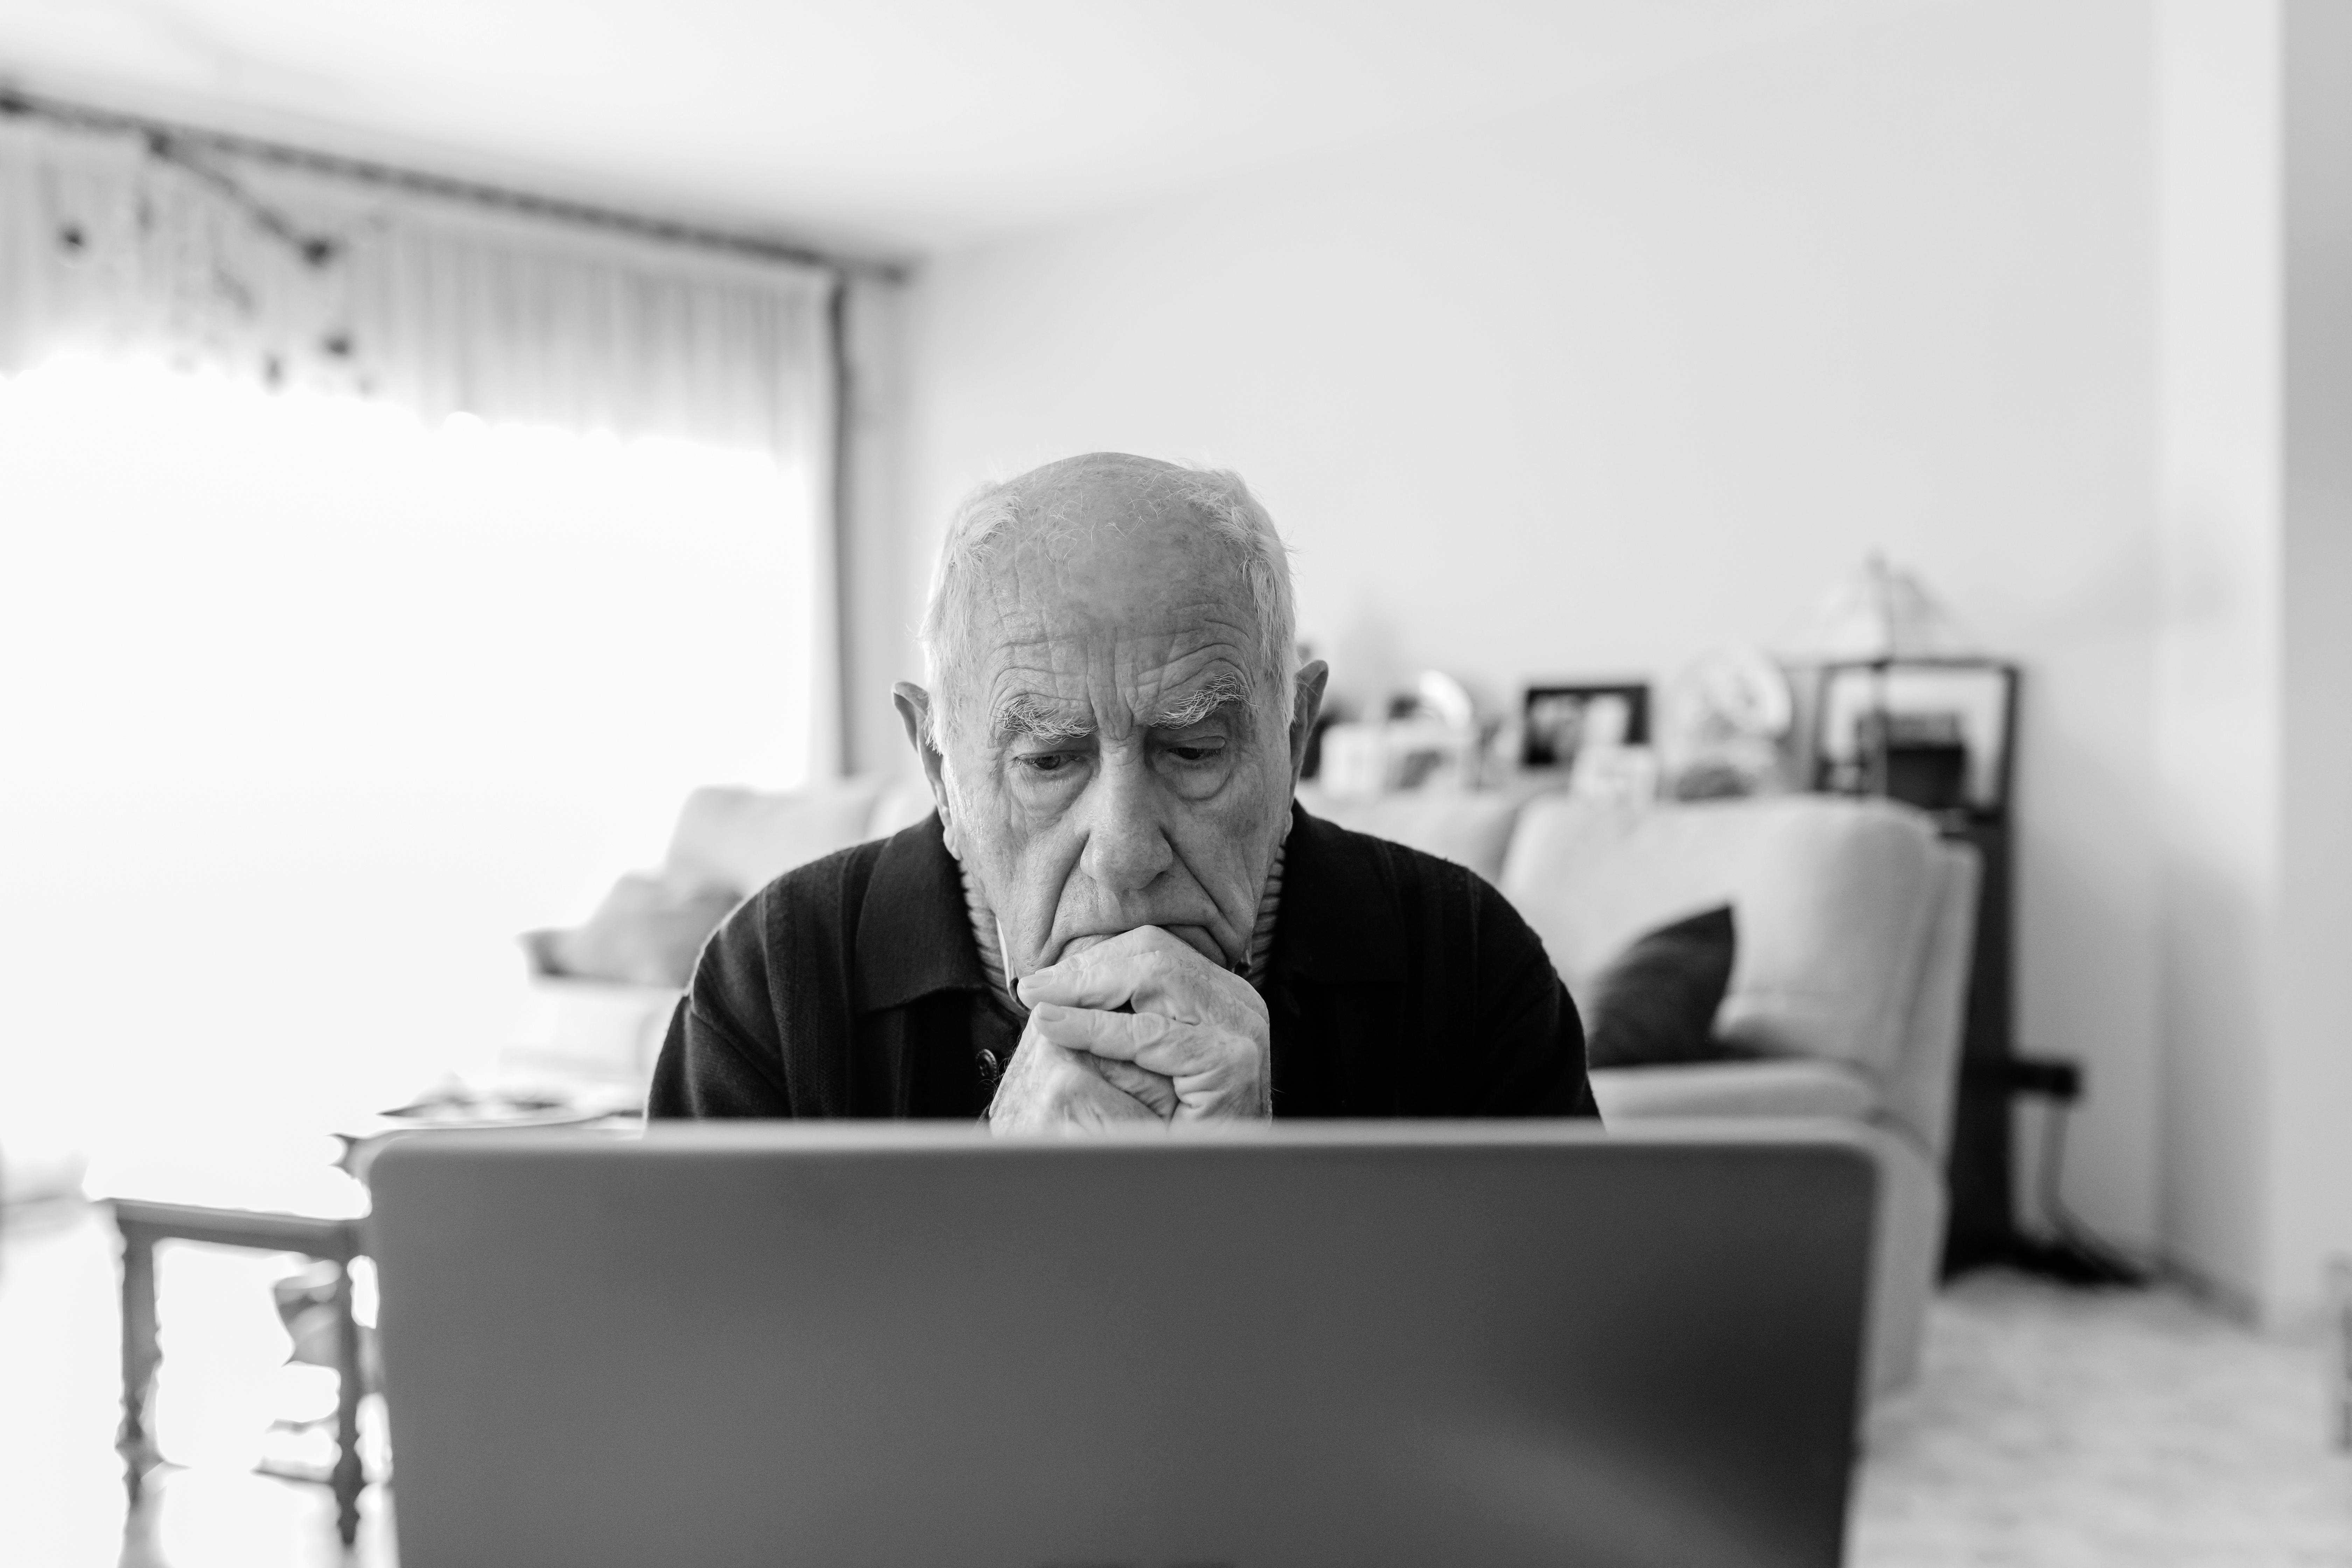 Portrait of senior man using laptop at home